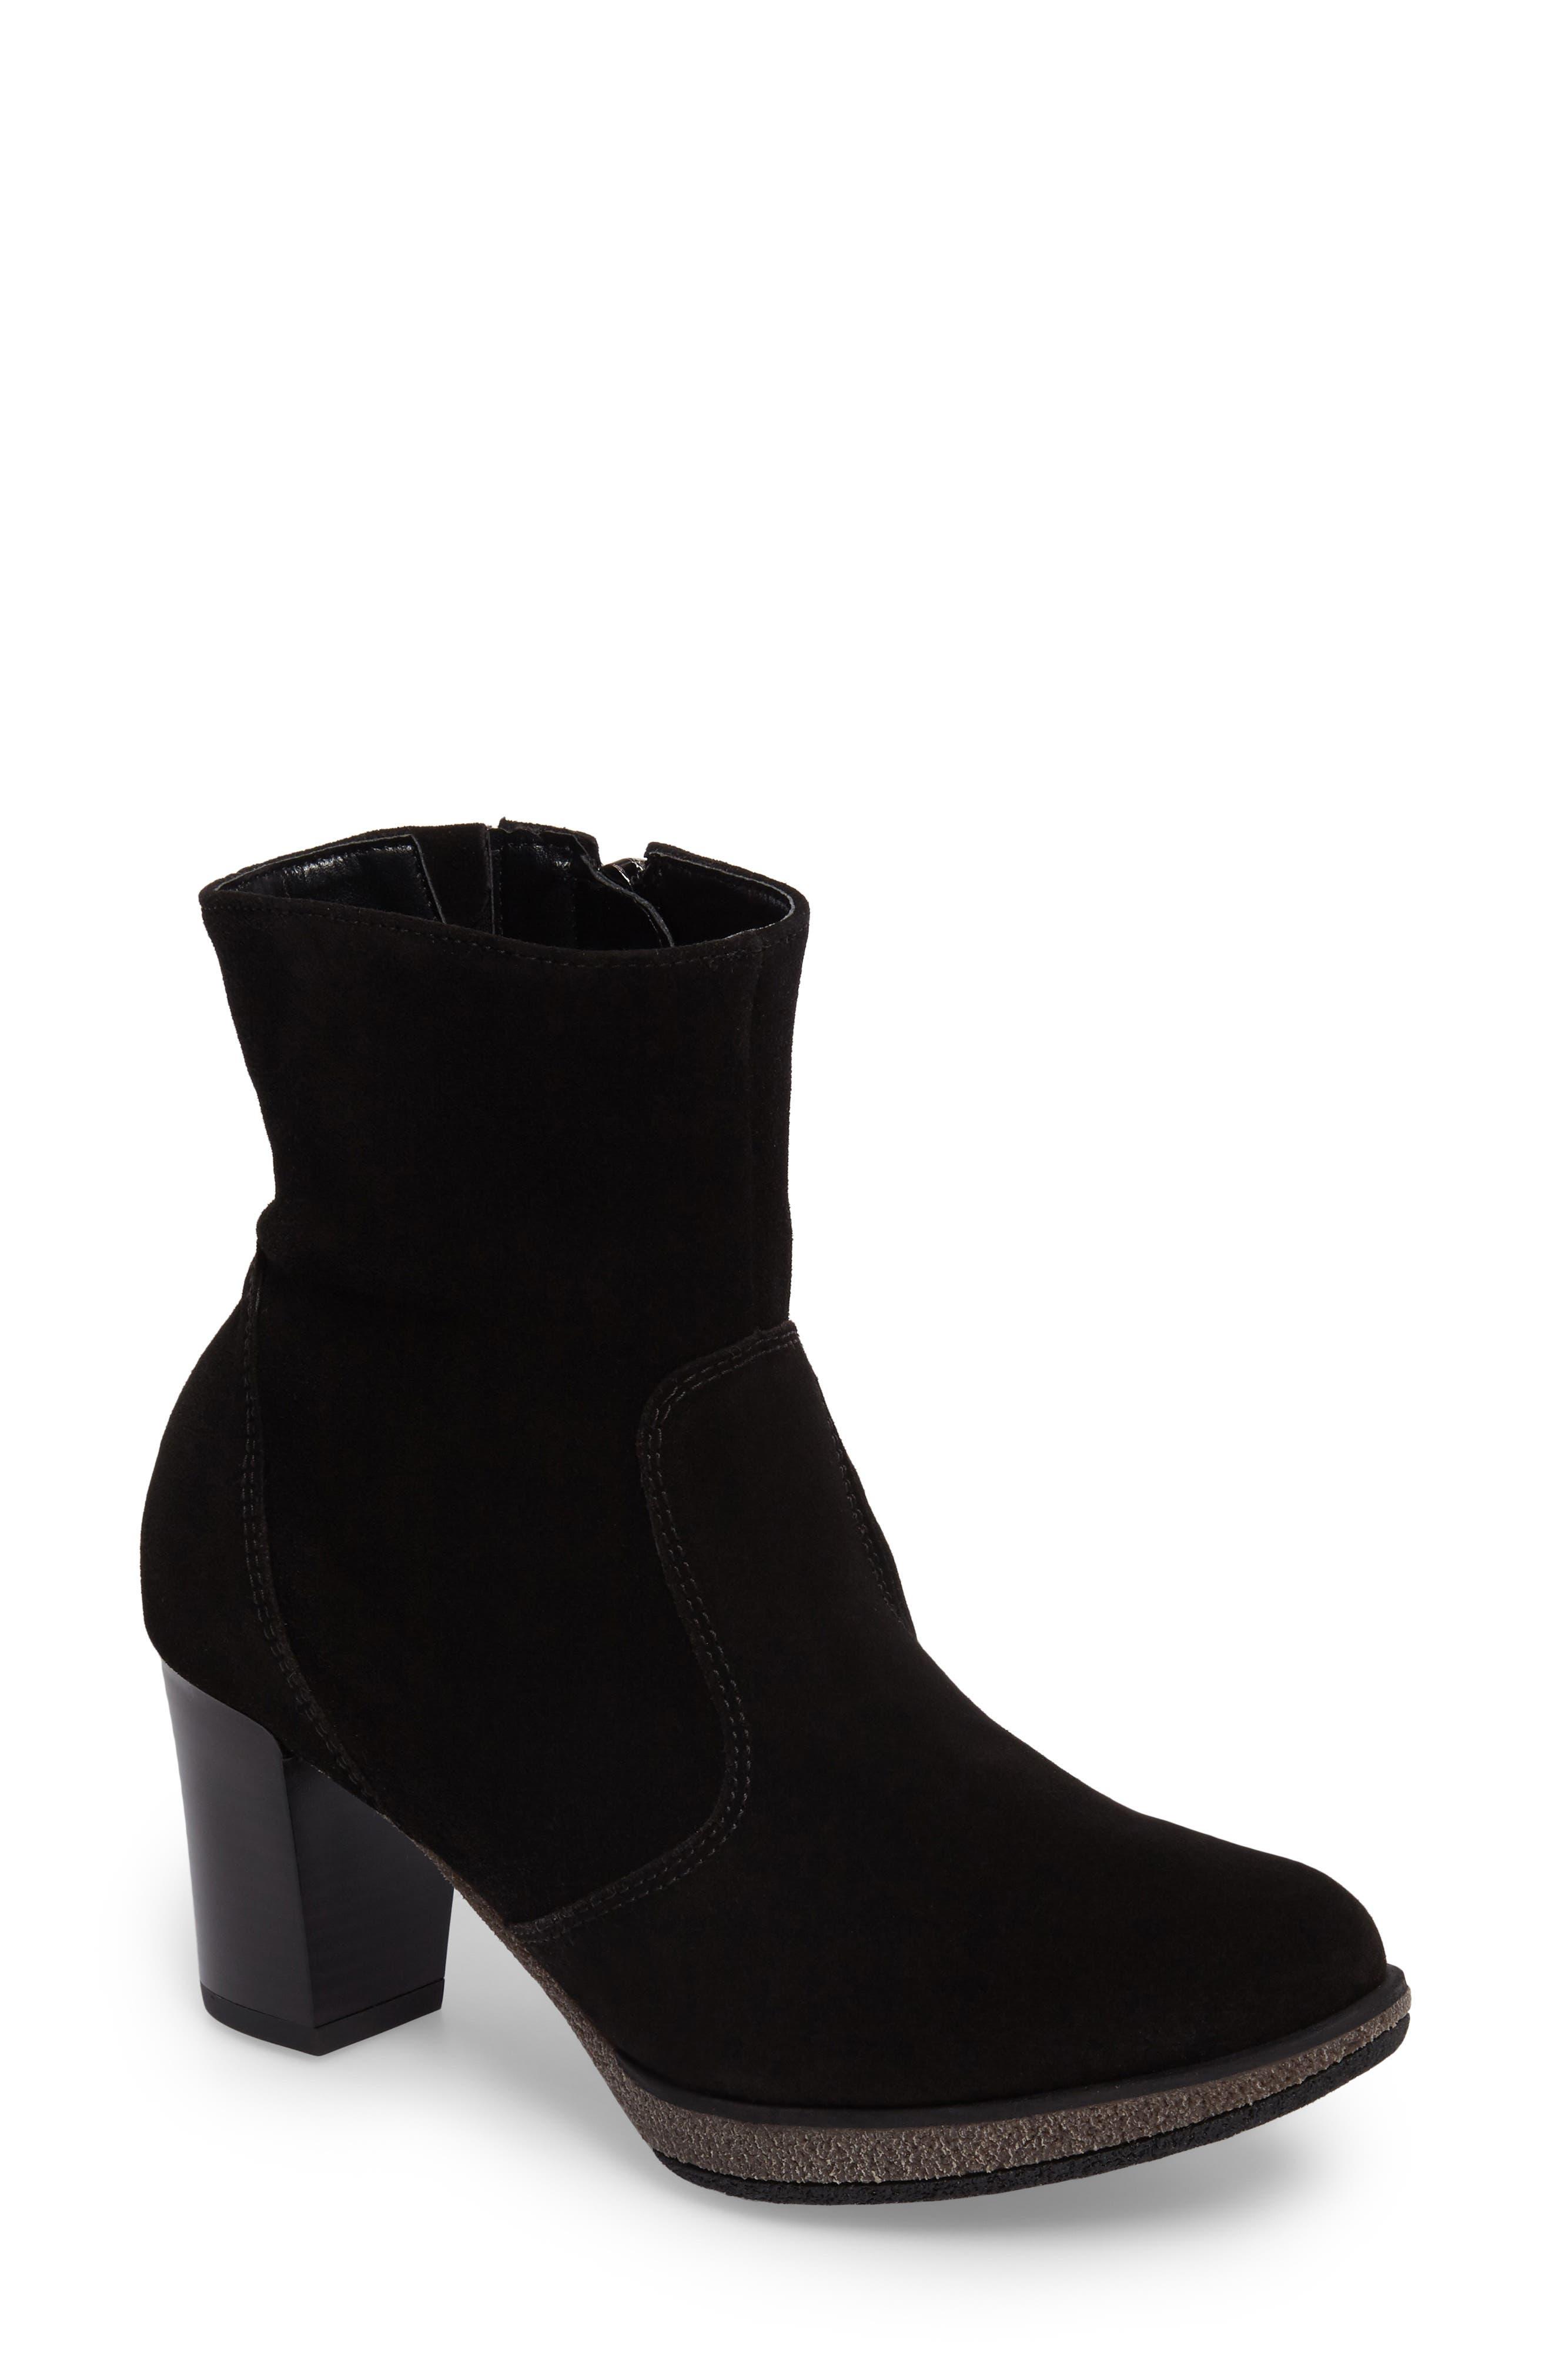 Bristol Bootie,                         Main,                         color, Black Leather